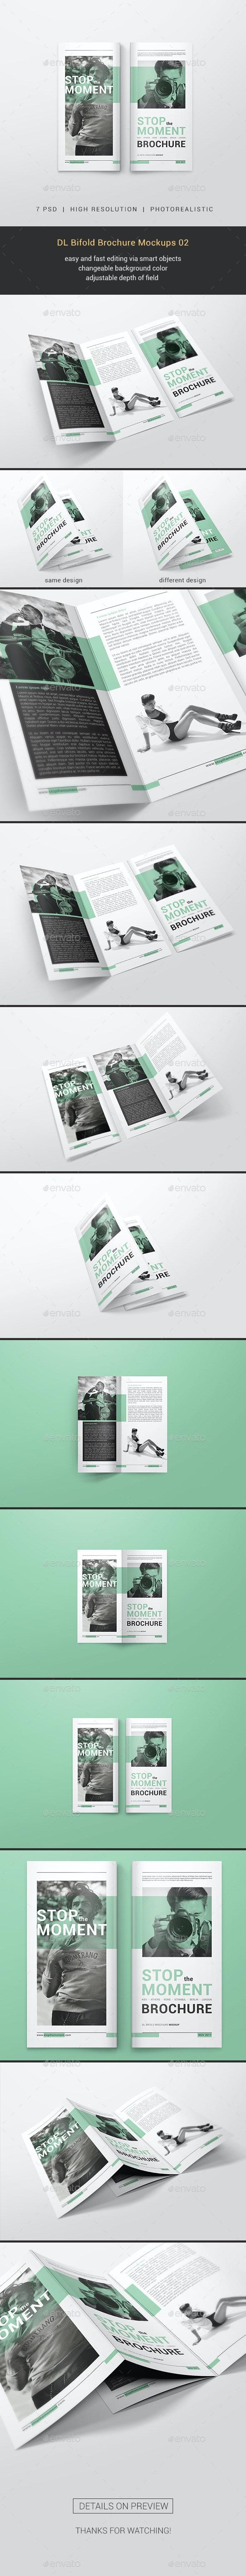 DL Bifold Brochure Mockups 02 - Brochures Print